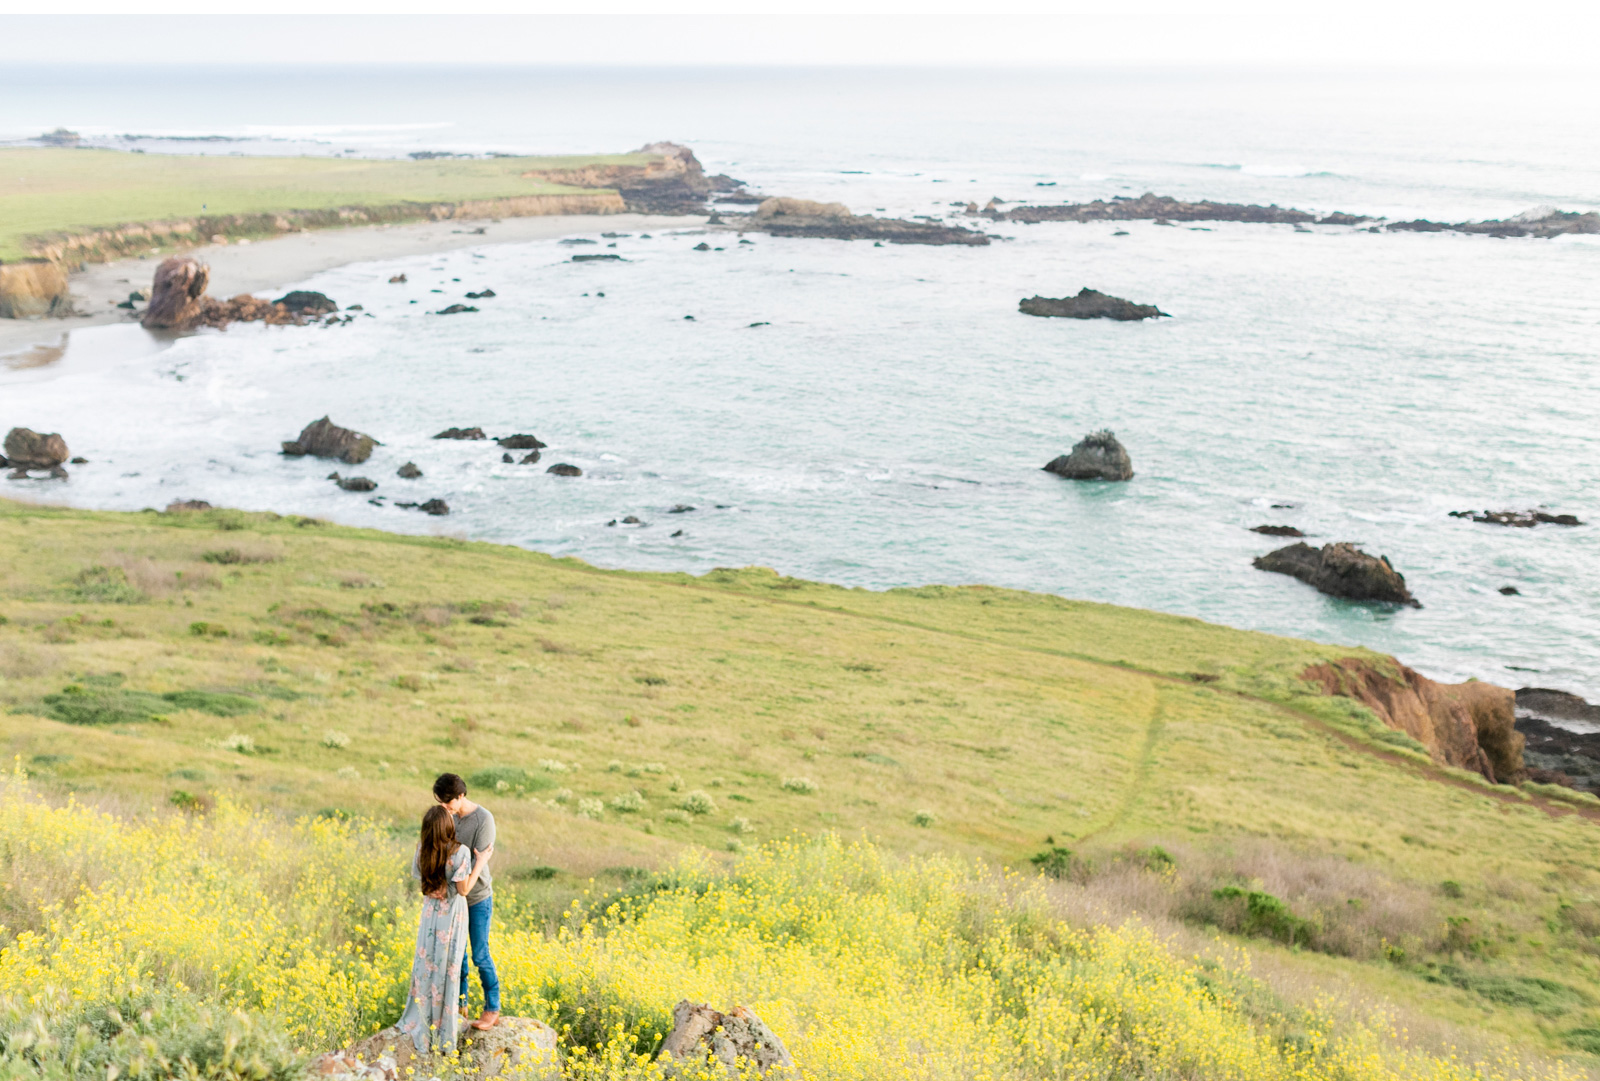 San-Luis-Obispo-Wedding-Green-Hills-Natalie-Schutt-Photography_04.jpg